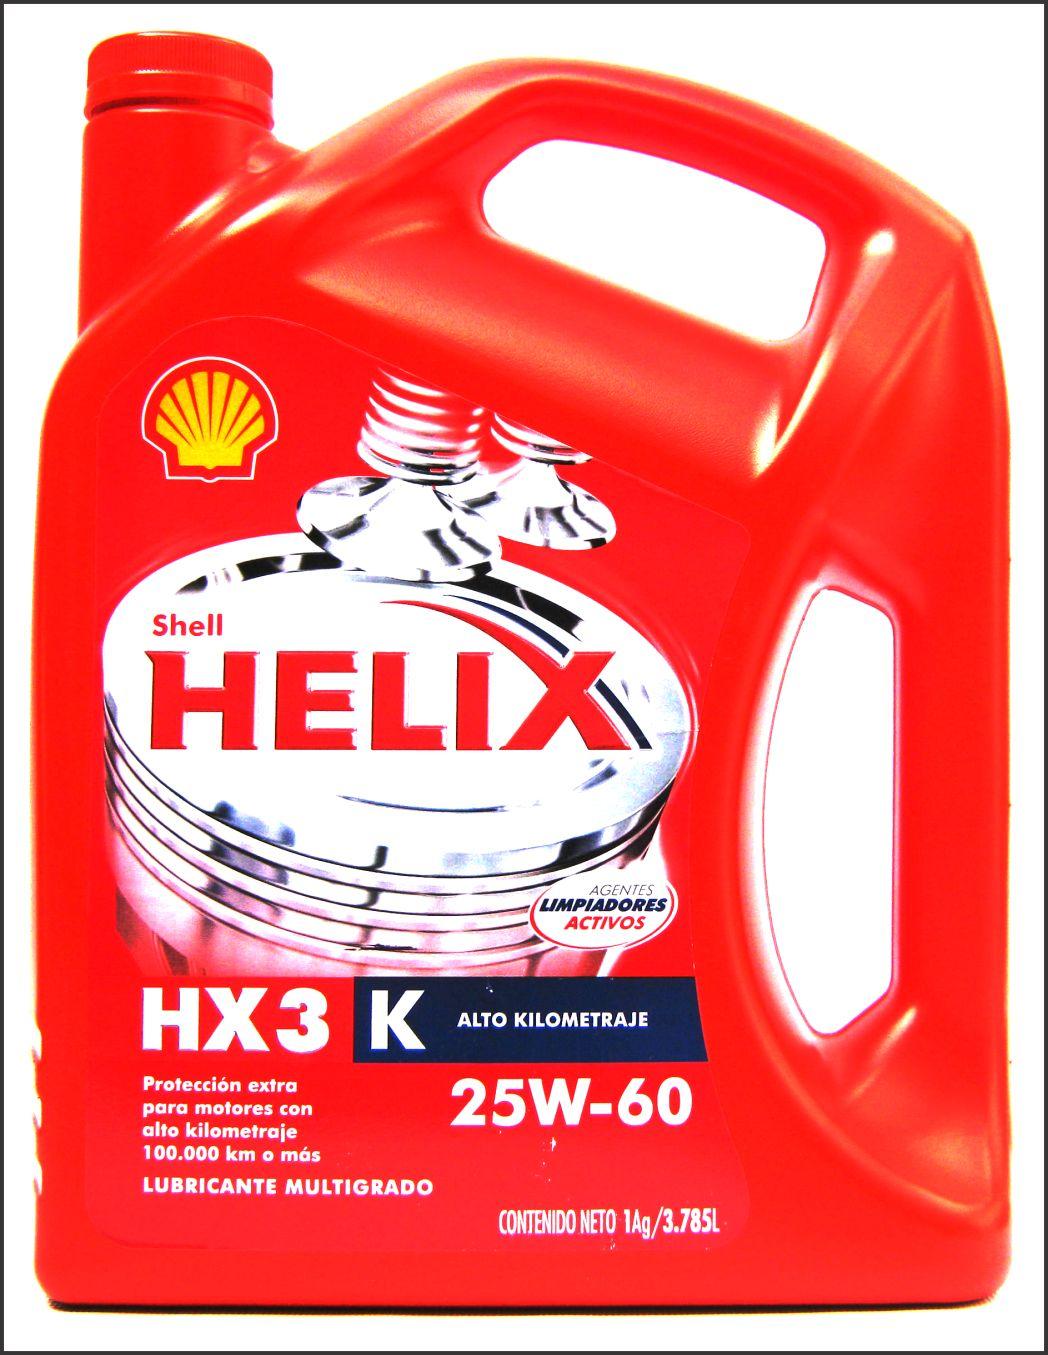 ¿Qué aceite usar? SHELL%20HELIX%20HX3%20K%2025W-60%20GALON